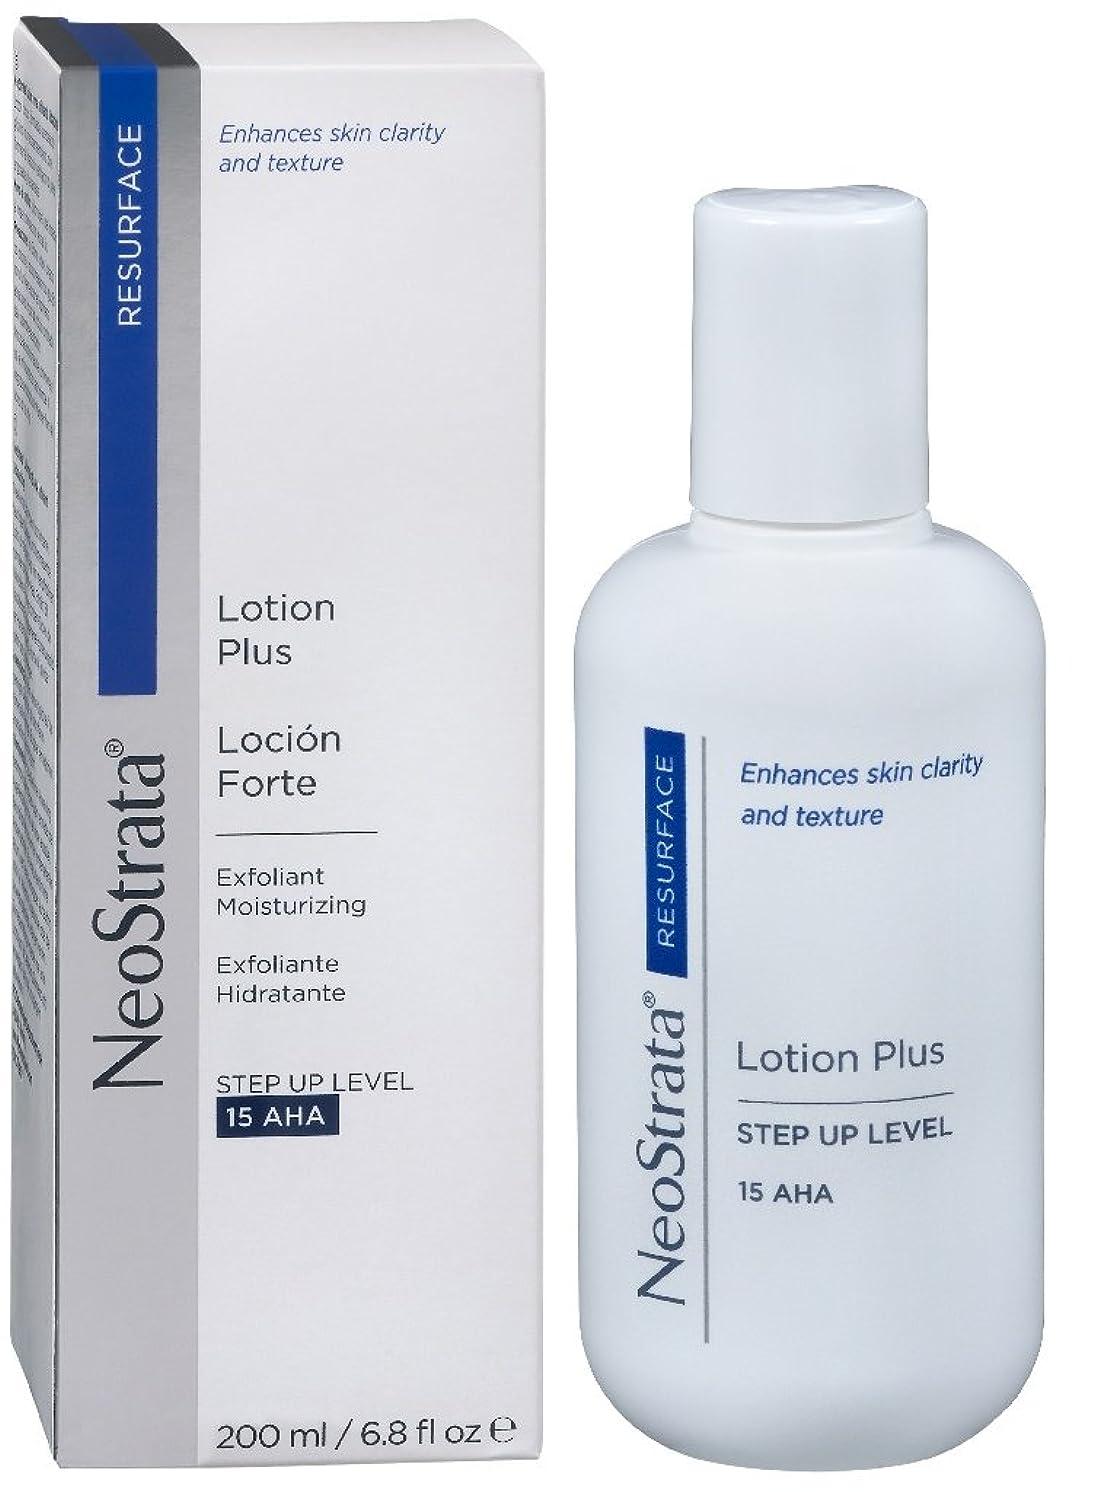 Neostrata Resurface Lotion Plus Aha 15 - 6.8fl Oz / 200ml Care the Skin